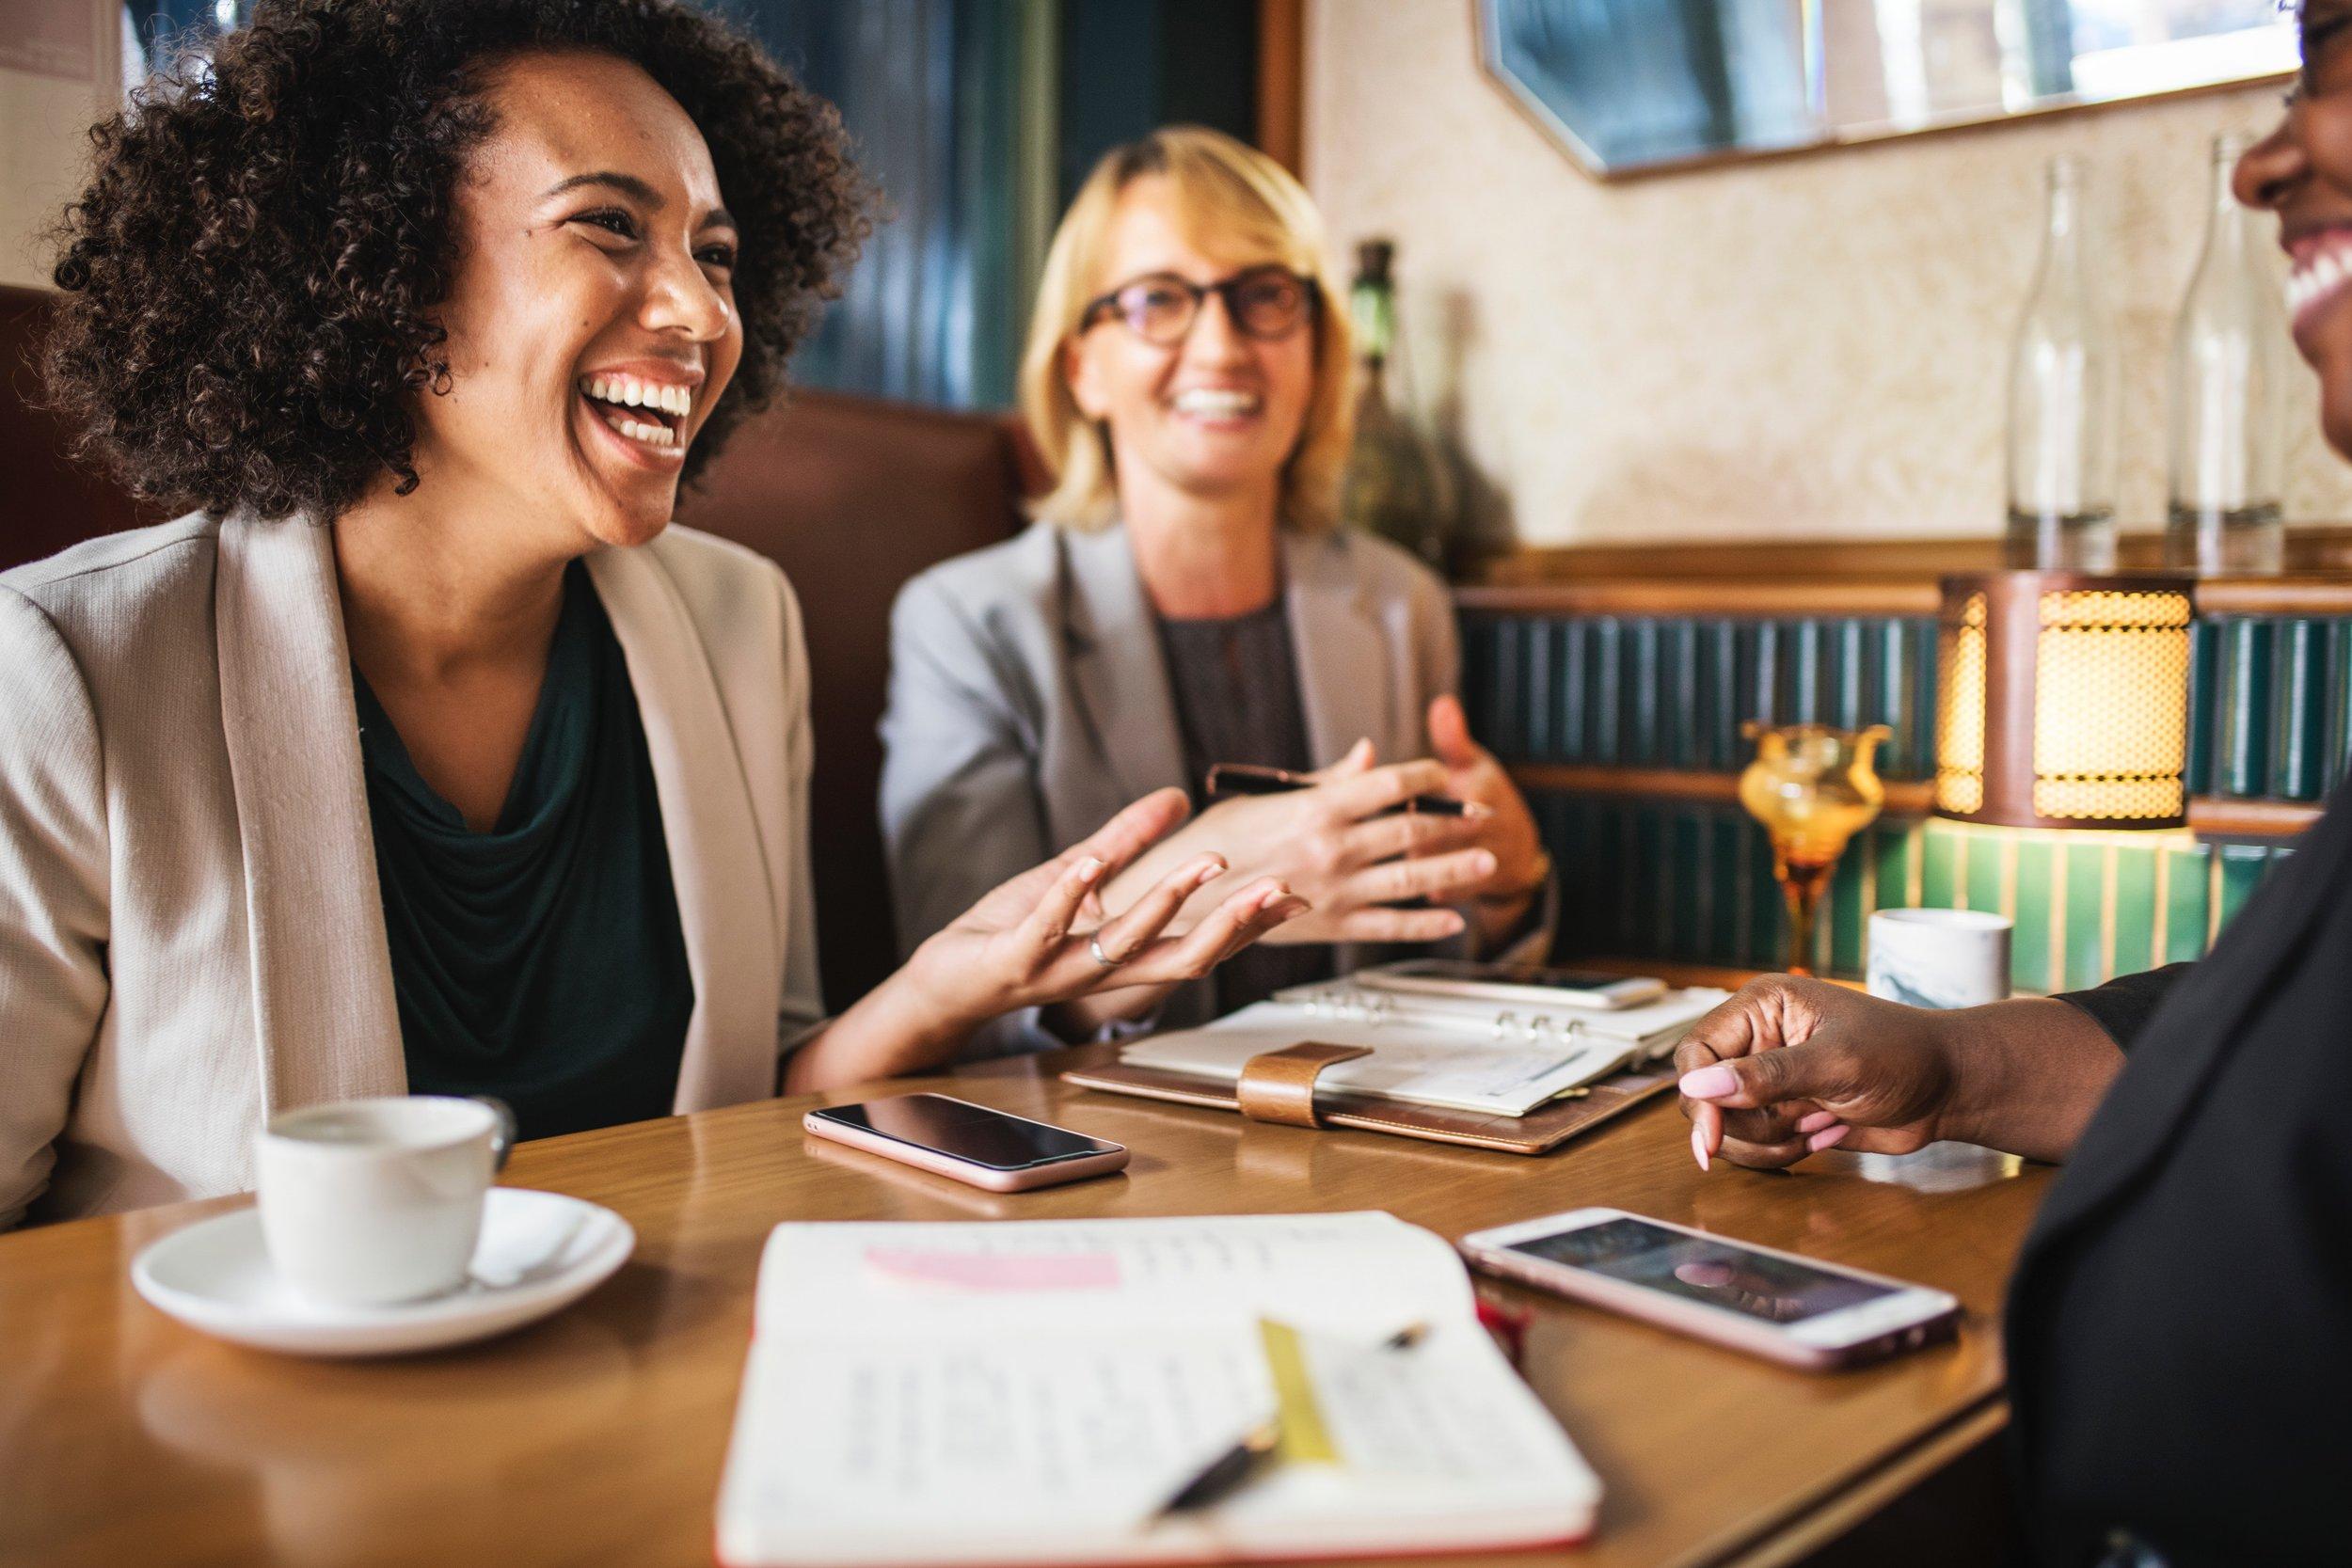 beautiful-business-meeting-businesswomen-1520137.jpg